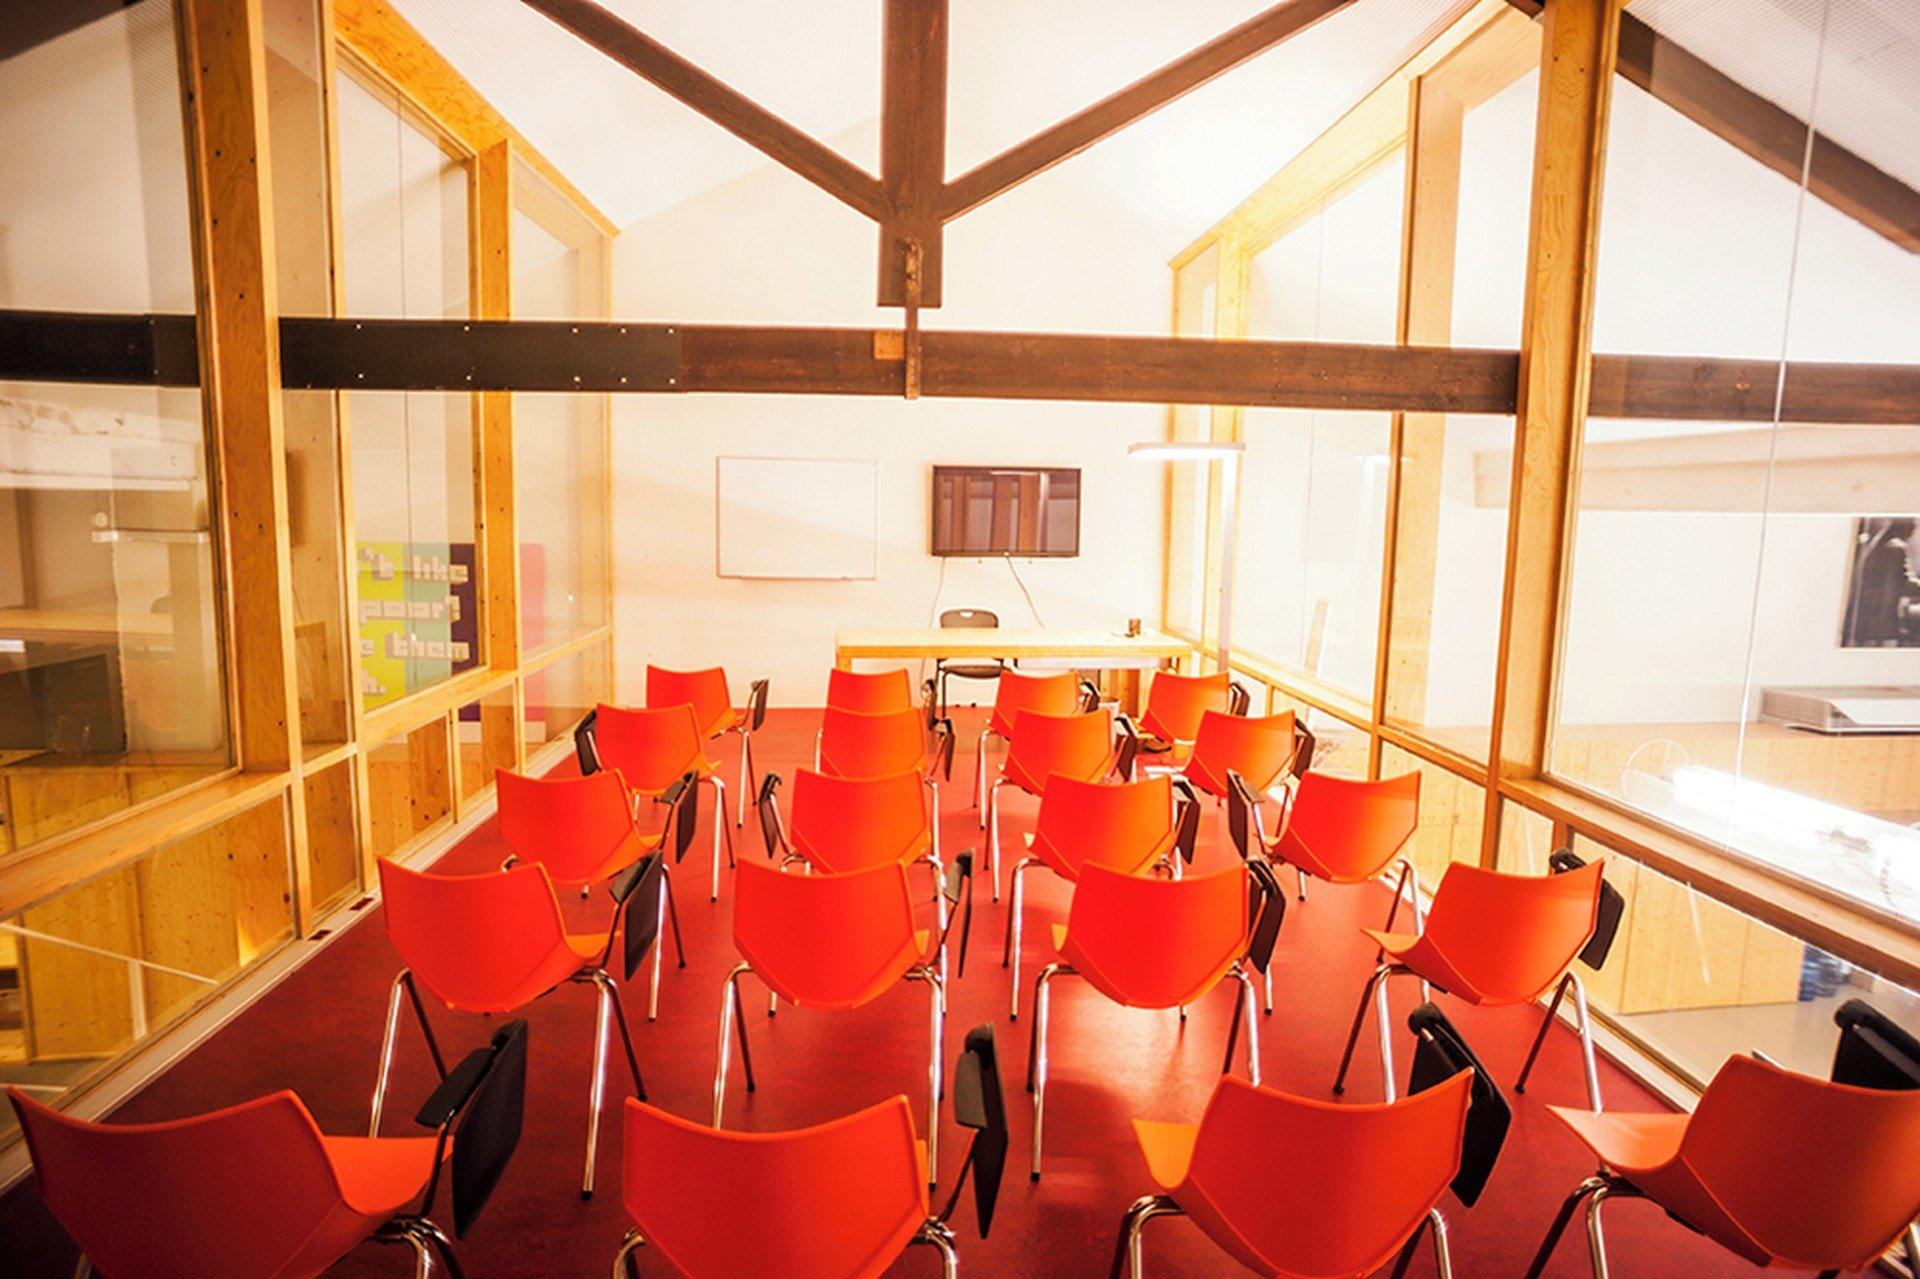 Barcelona training rooms Meetingraum CREC Coworking - Sala 1 image 0